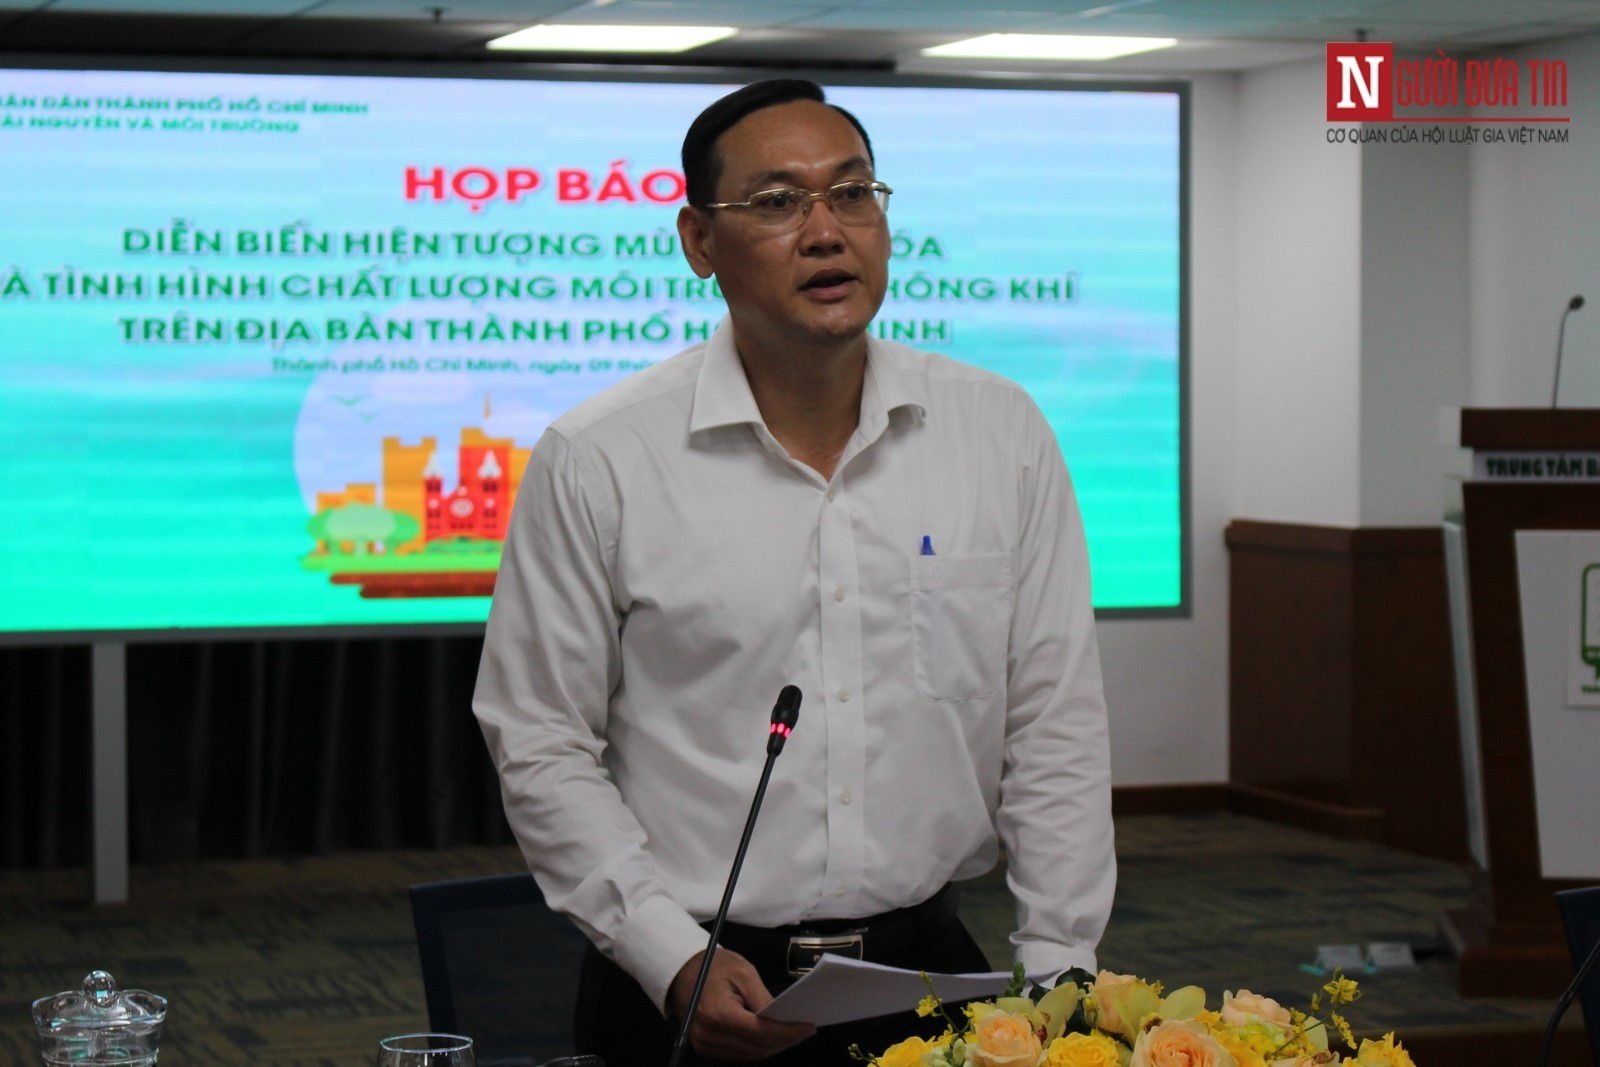 AirVisual pollution monitor app temporarily blocked in Vietnam